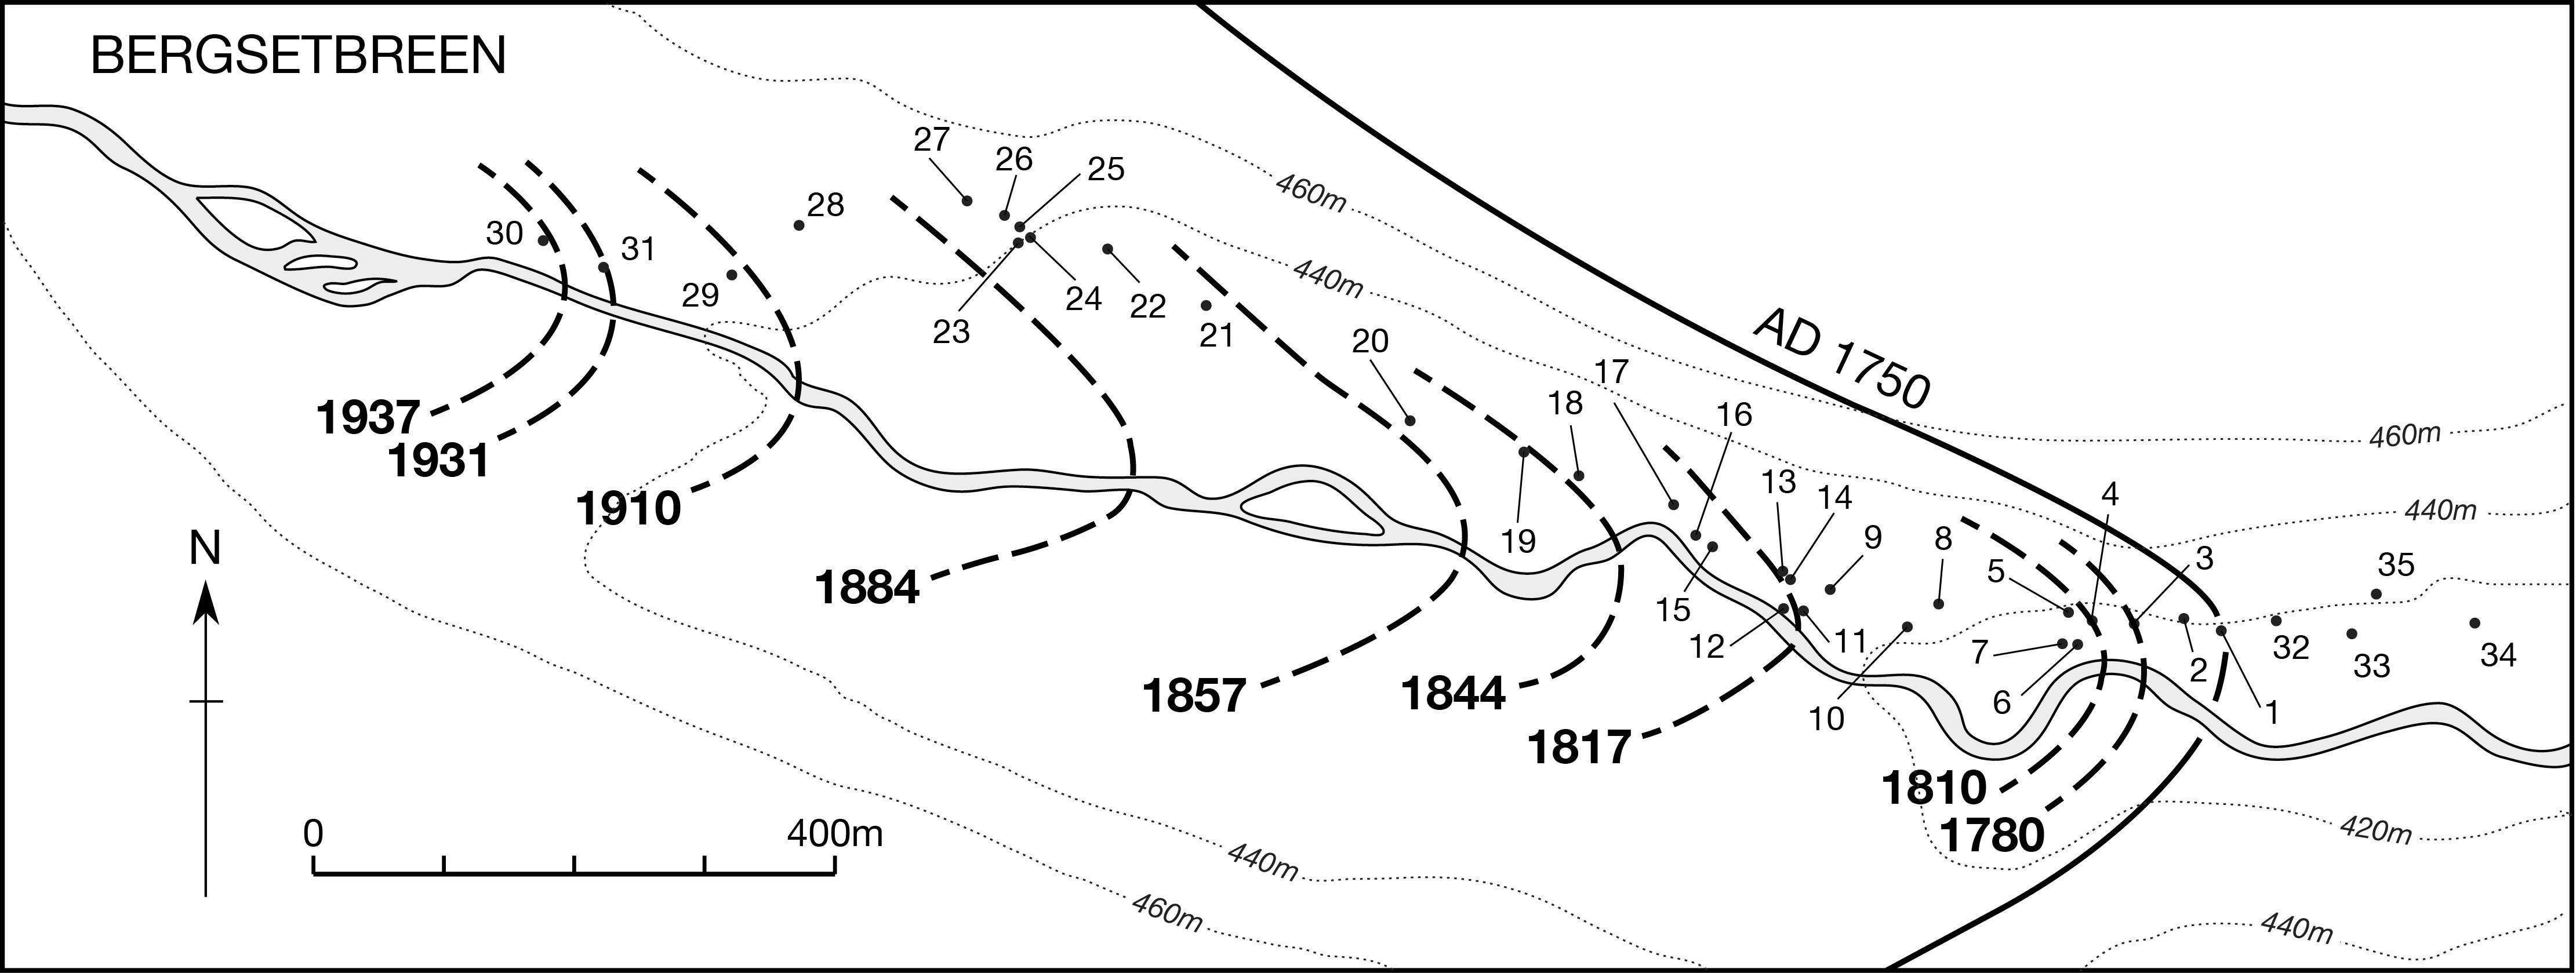 ANTS - Fig.3 - Bergsetbreen.jpg